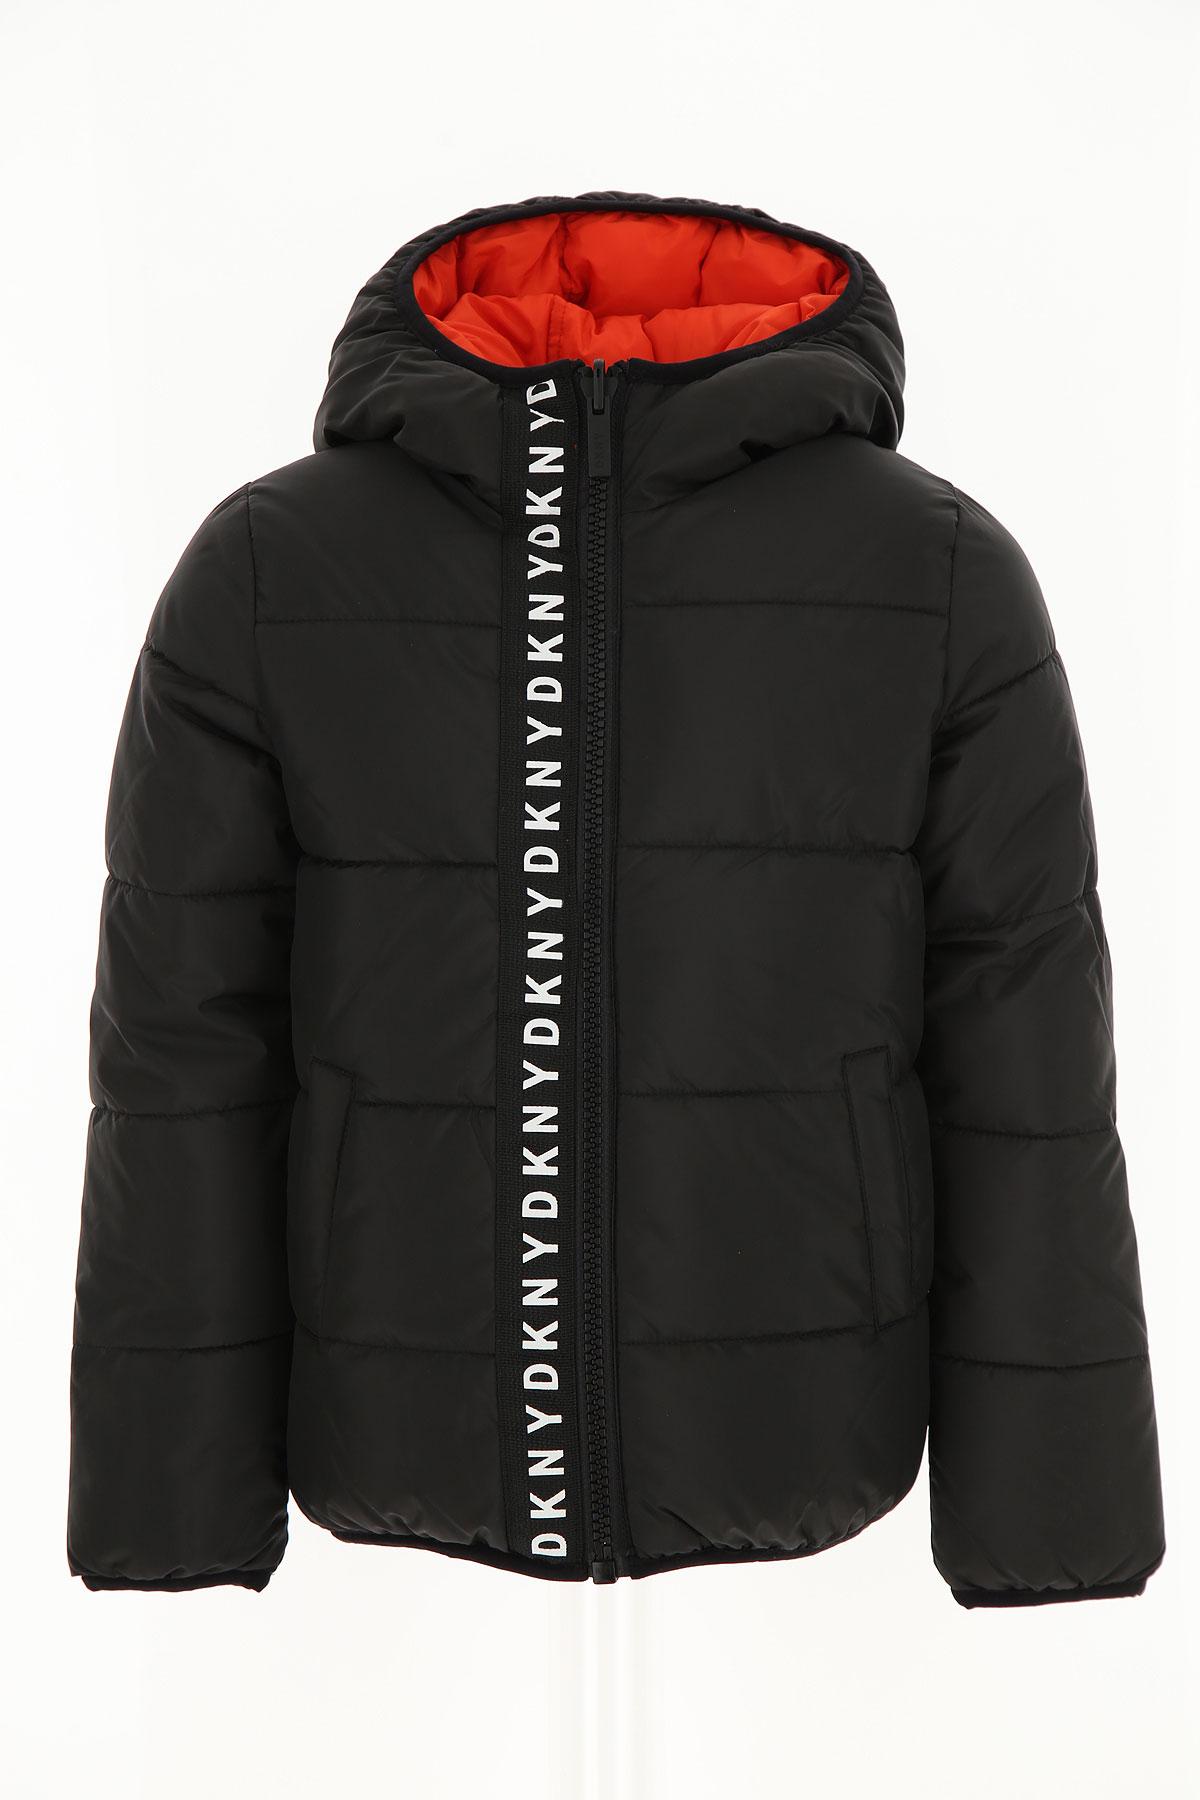 DKNY Boys Down Jacket for Kids, Puffer Ski Jacket On Sale, Black, polyester, 2019, 12Y 8Y